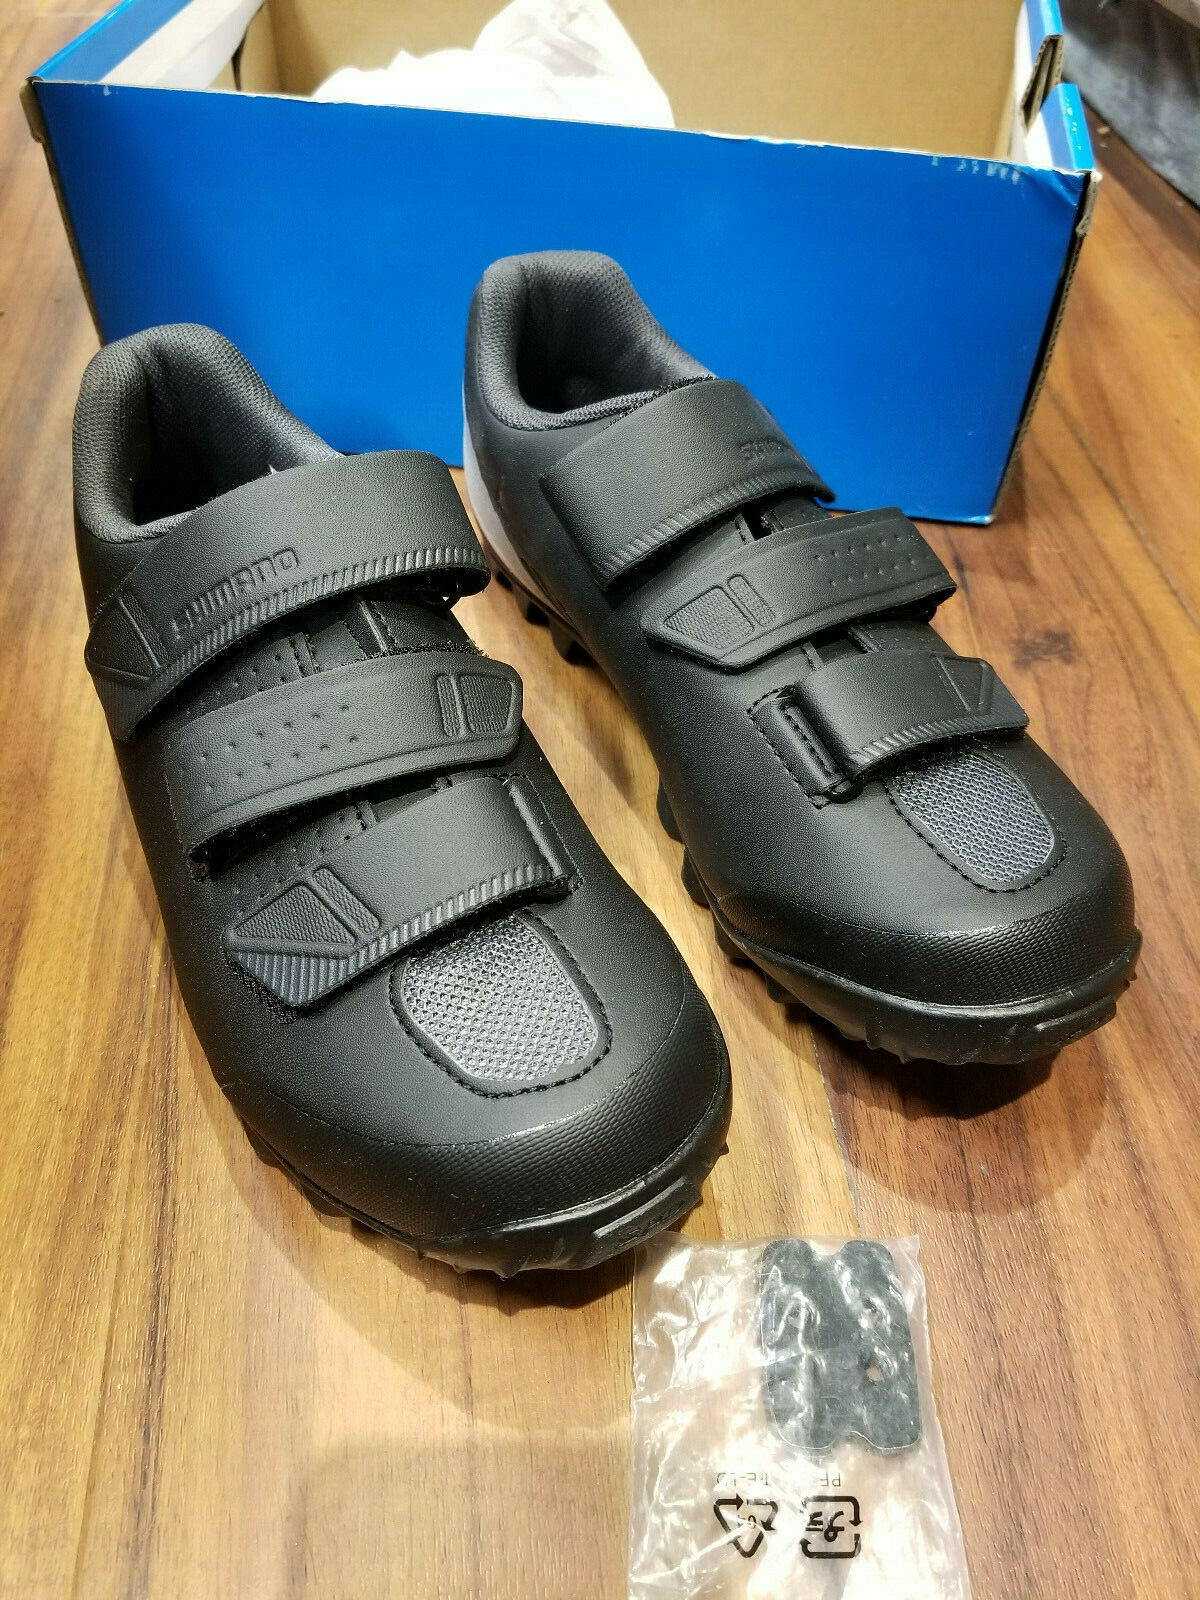 Shimano ME2 Mountain Bike Enduro Shoes SH-ME200 Mens Size 42 48 US 8.3 to 12.3